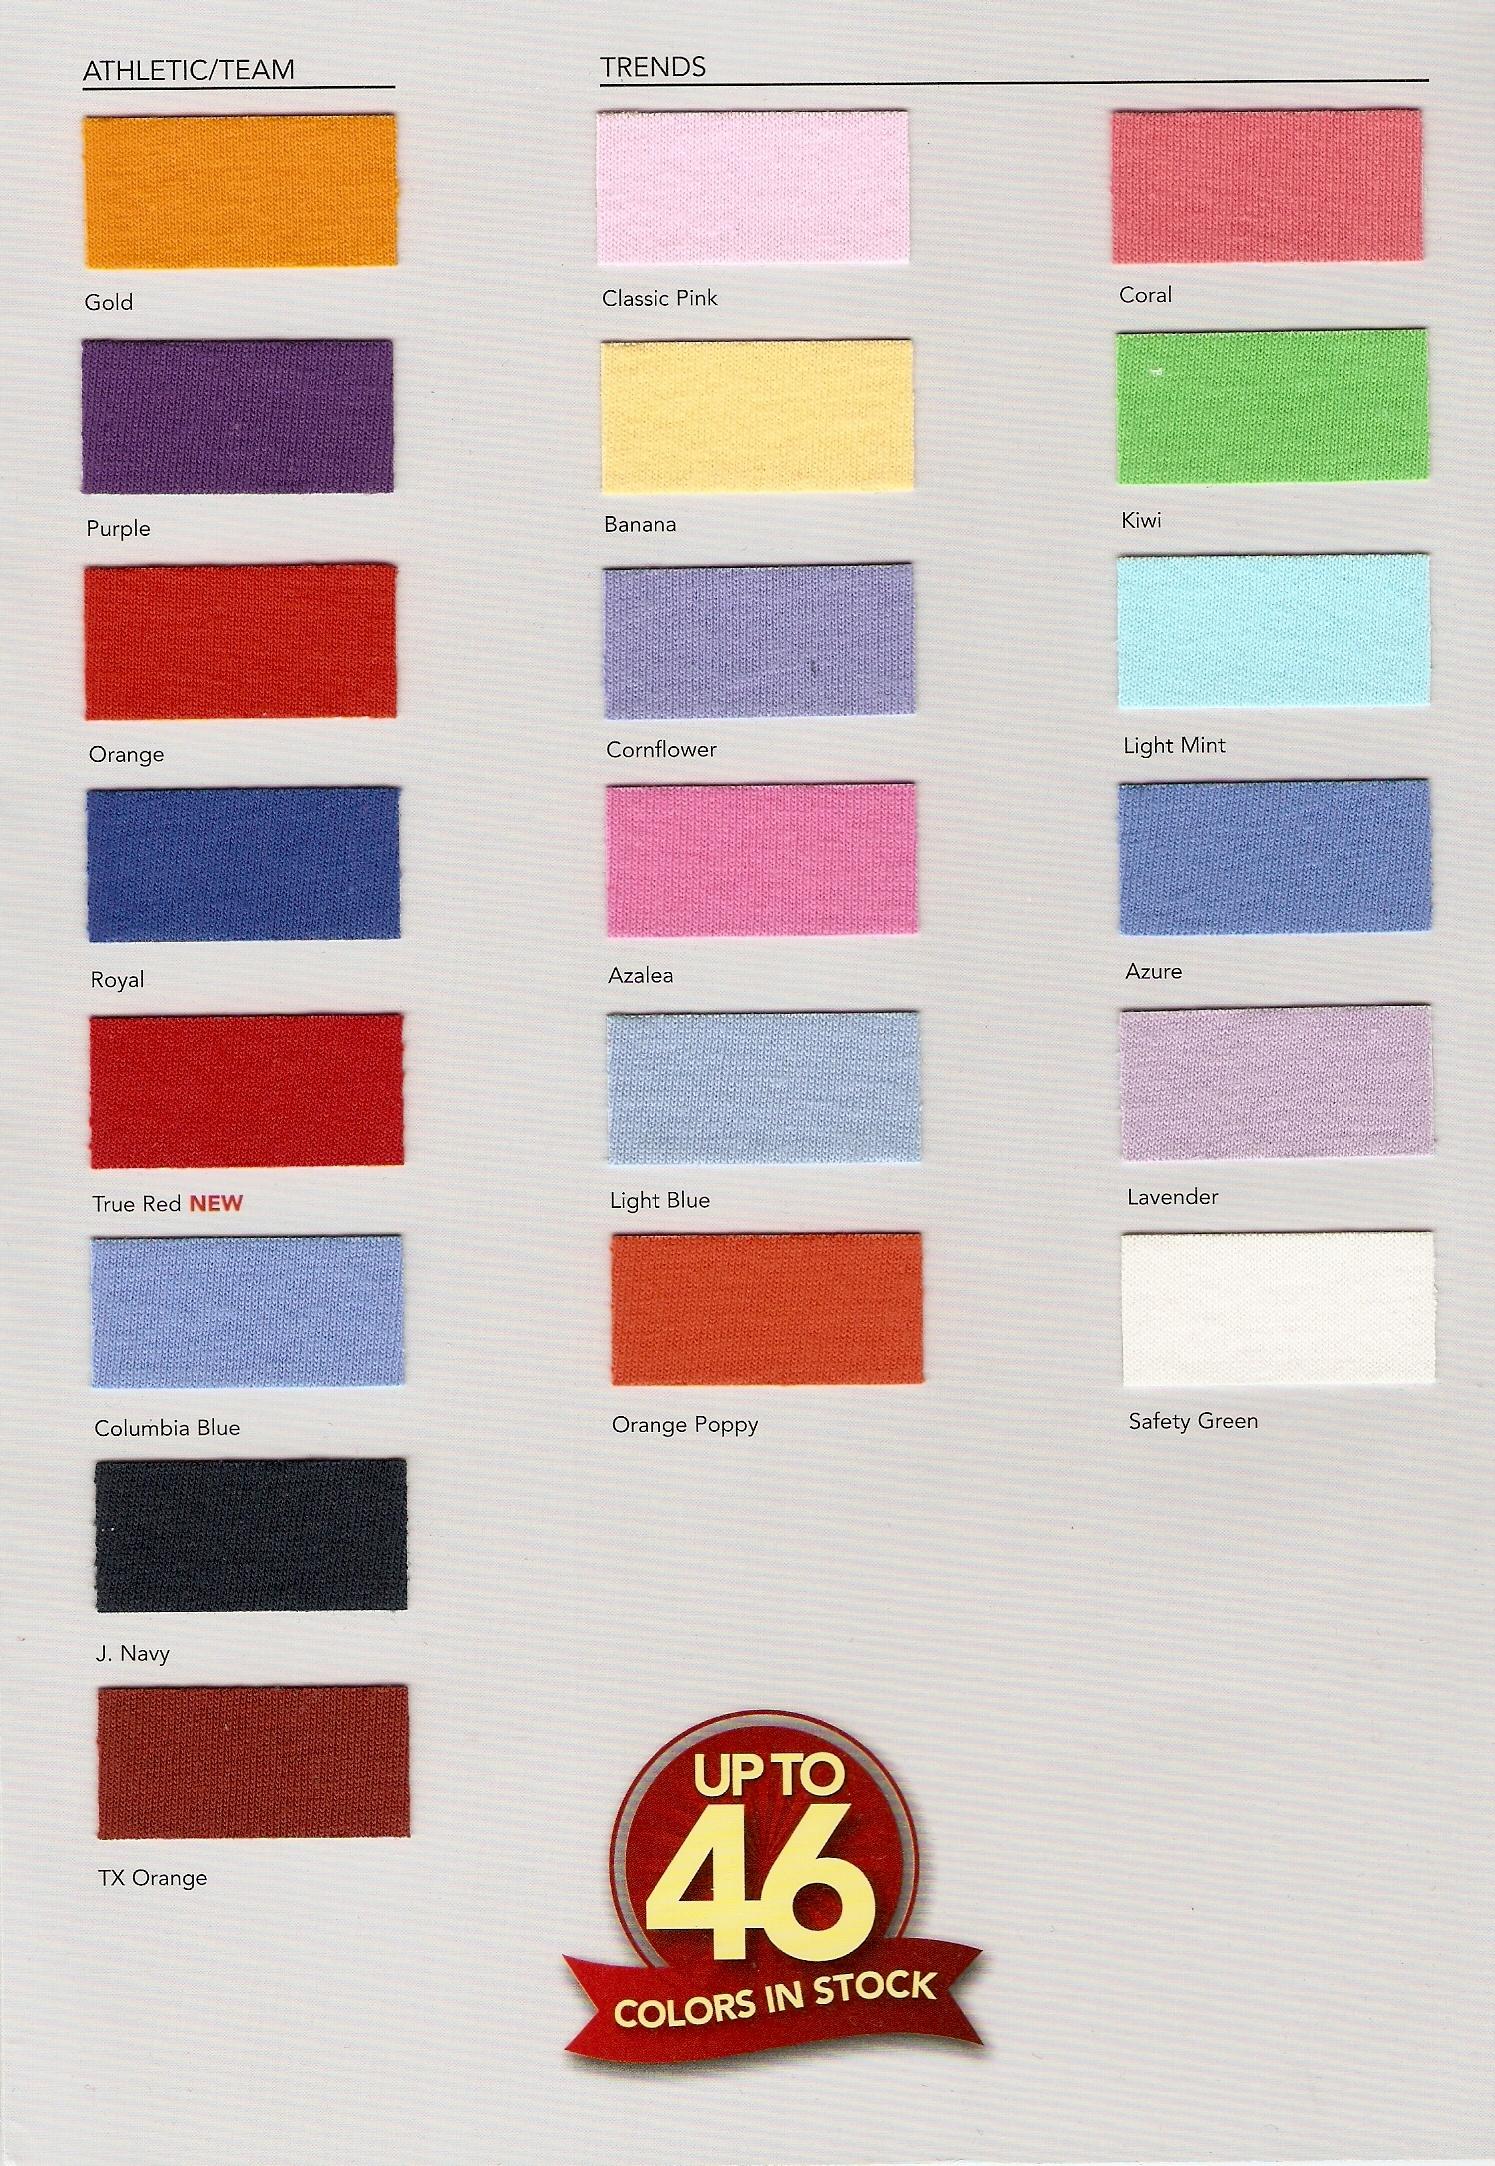 Fruit color image designers inc imprinted gildan color hanes color jerzee color fruit color anvil delta custom screenprinting artwork advertising nvjuhfo Images